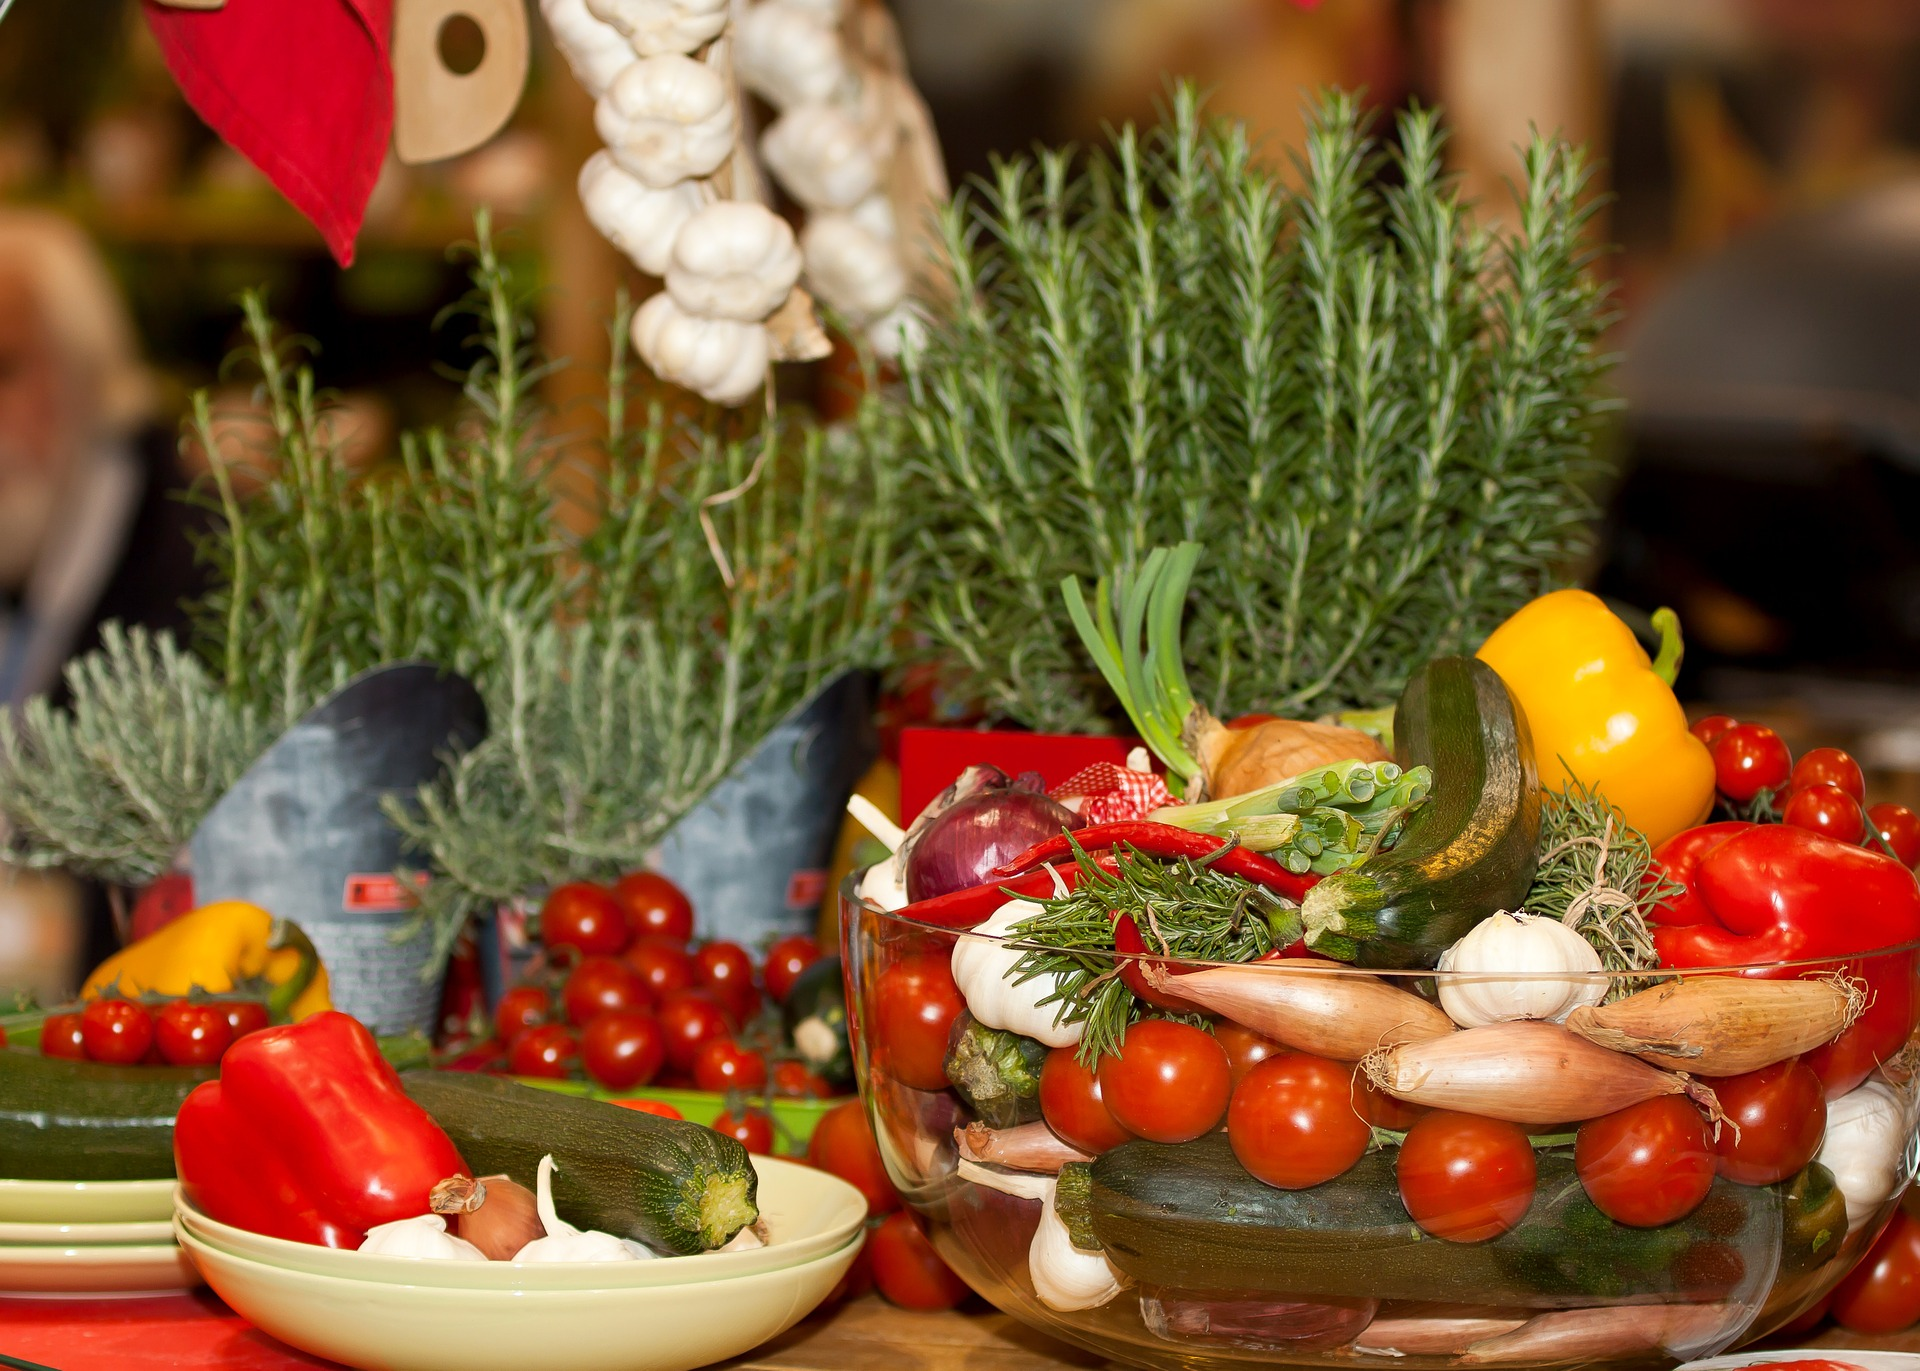 vegetables-1201413_1920.jpg